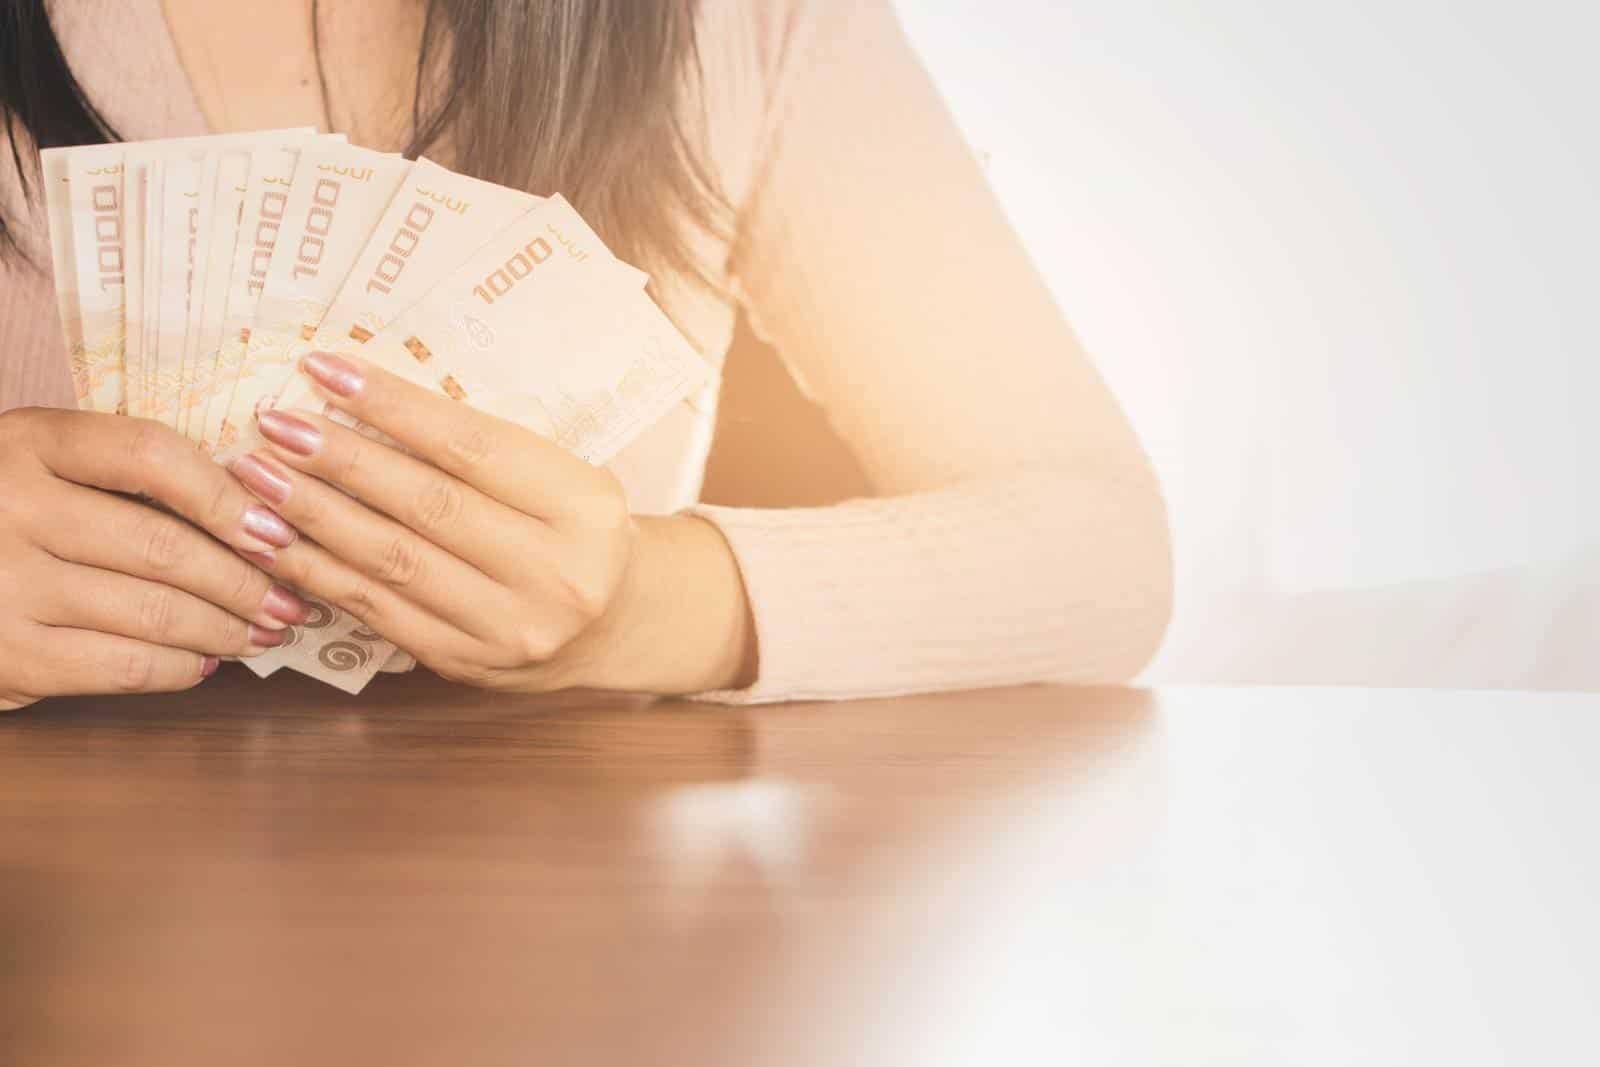 Brzi gotovinski krediti